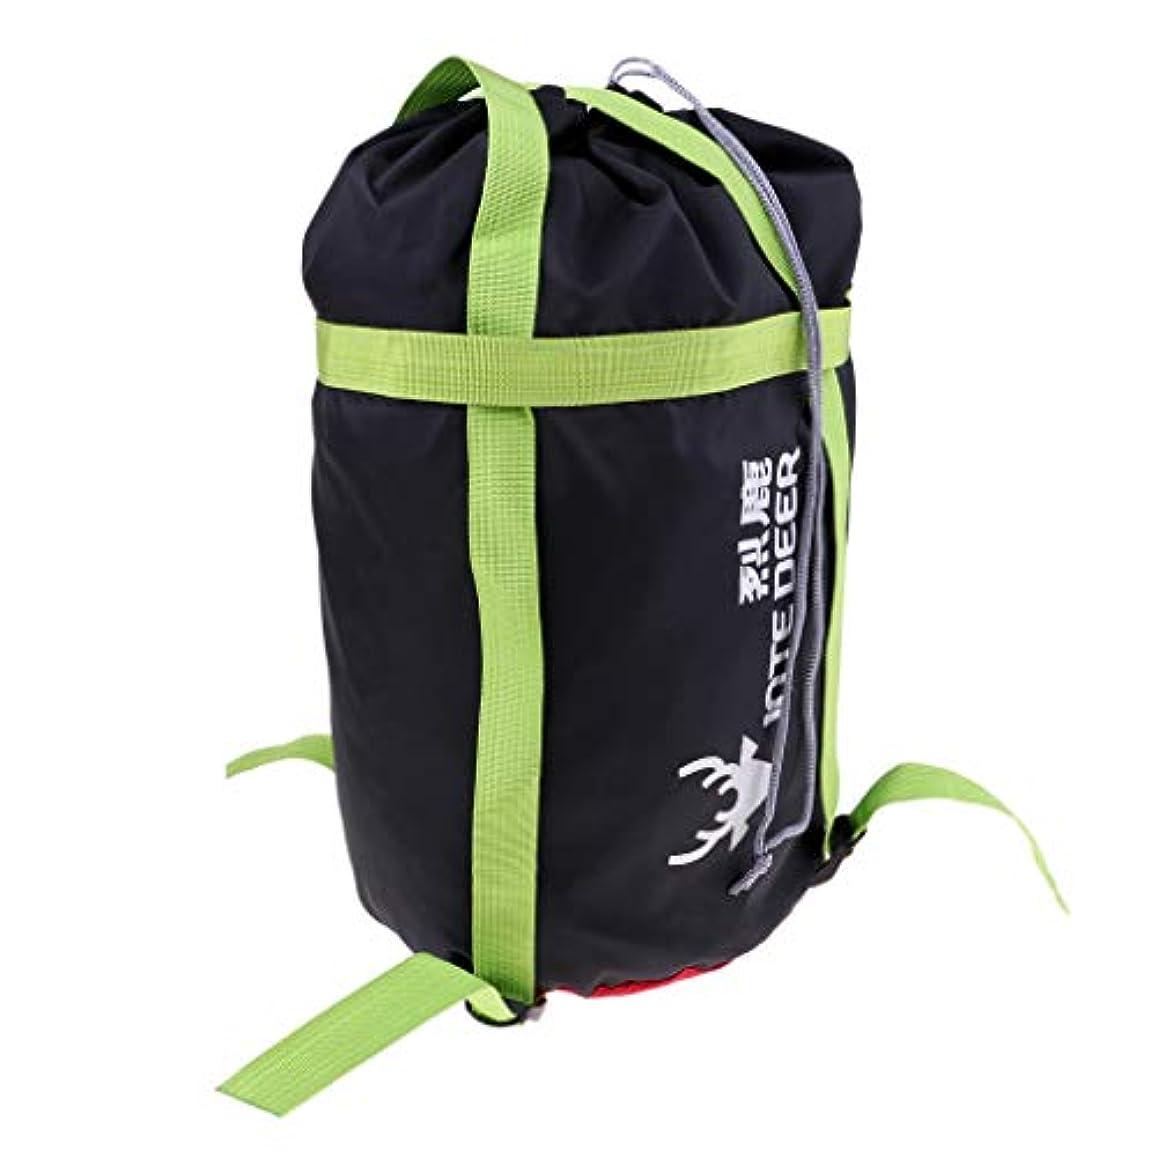 Sharplace 圧縮バッグ キャンプ 圧縮袋 巾着袋 圧縮サック 収納袋 アウトドア 全3色